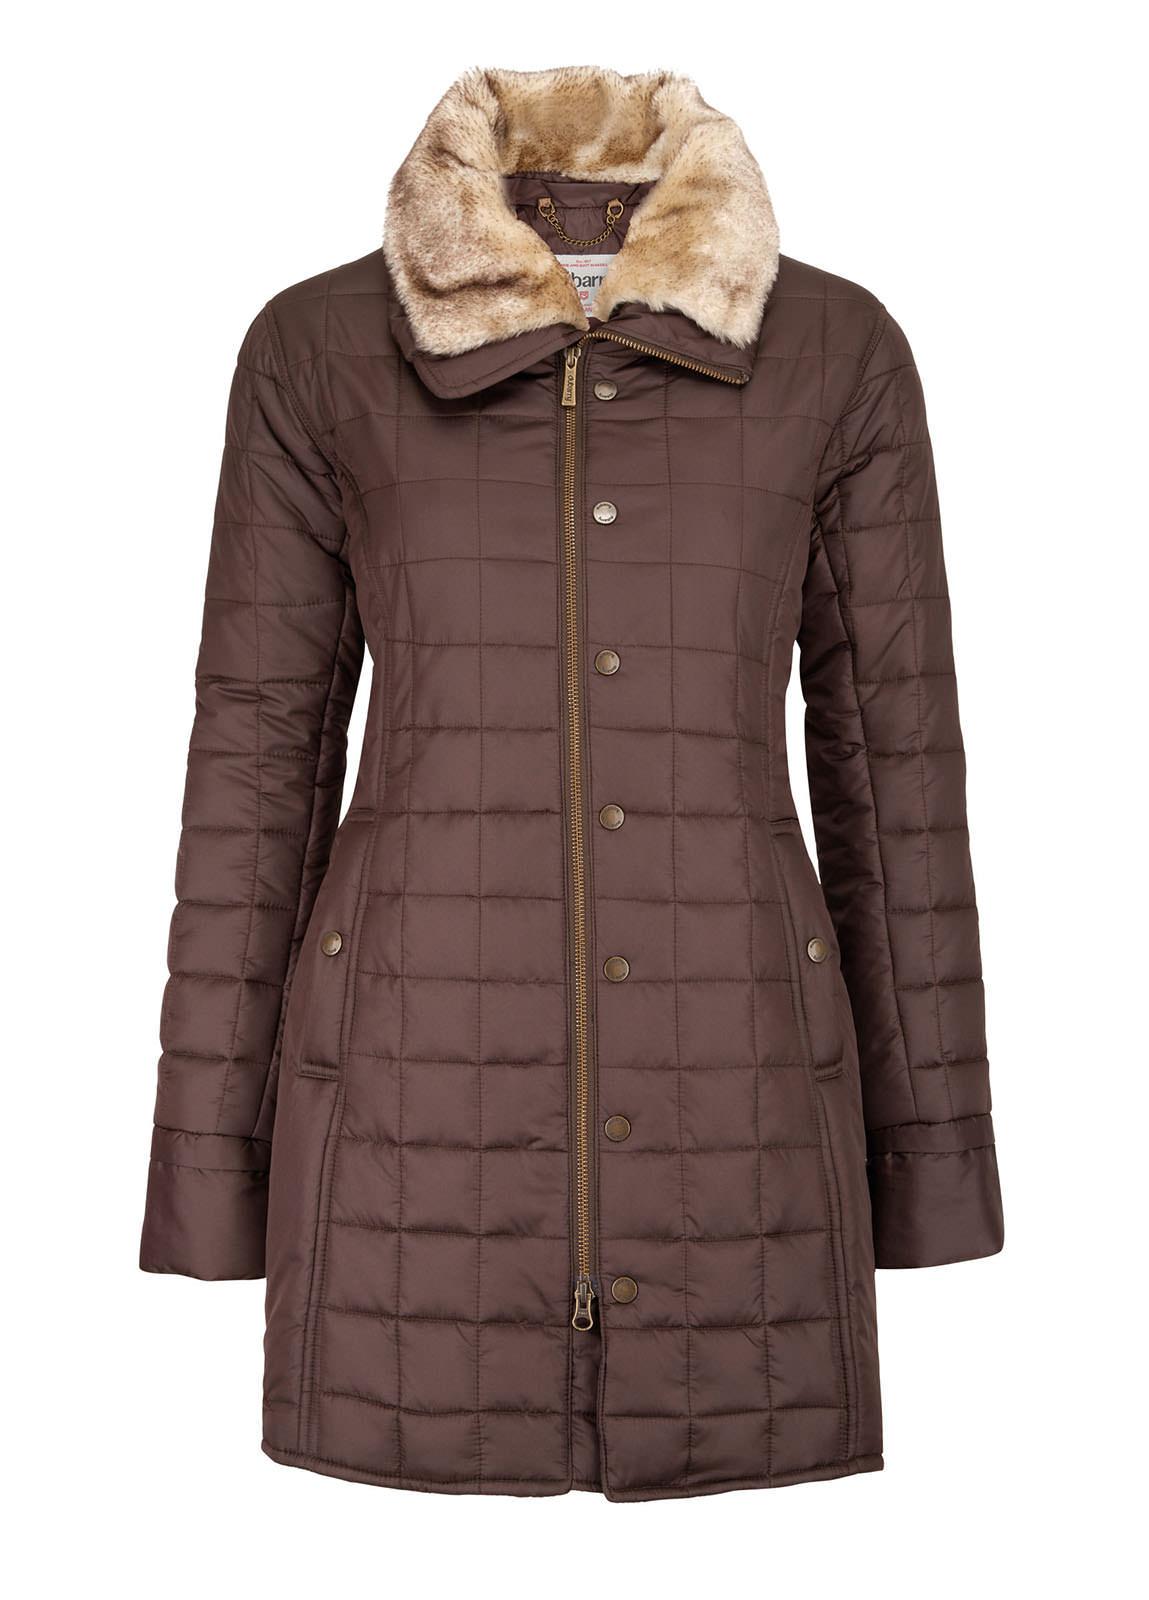 Dubarry_Erin Women's Quilted Coat - Raspberry_Image_2